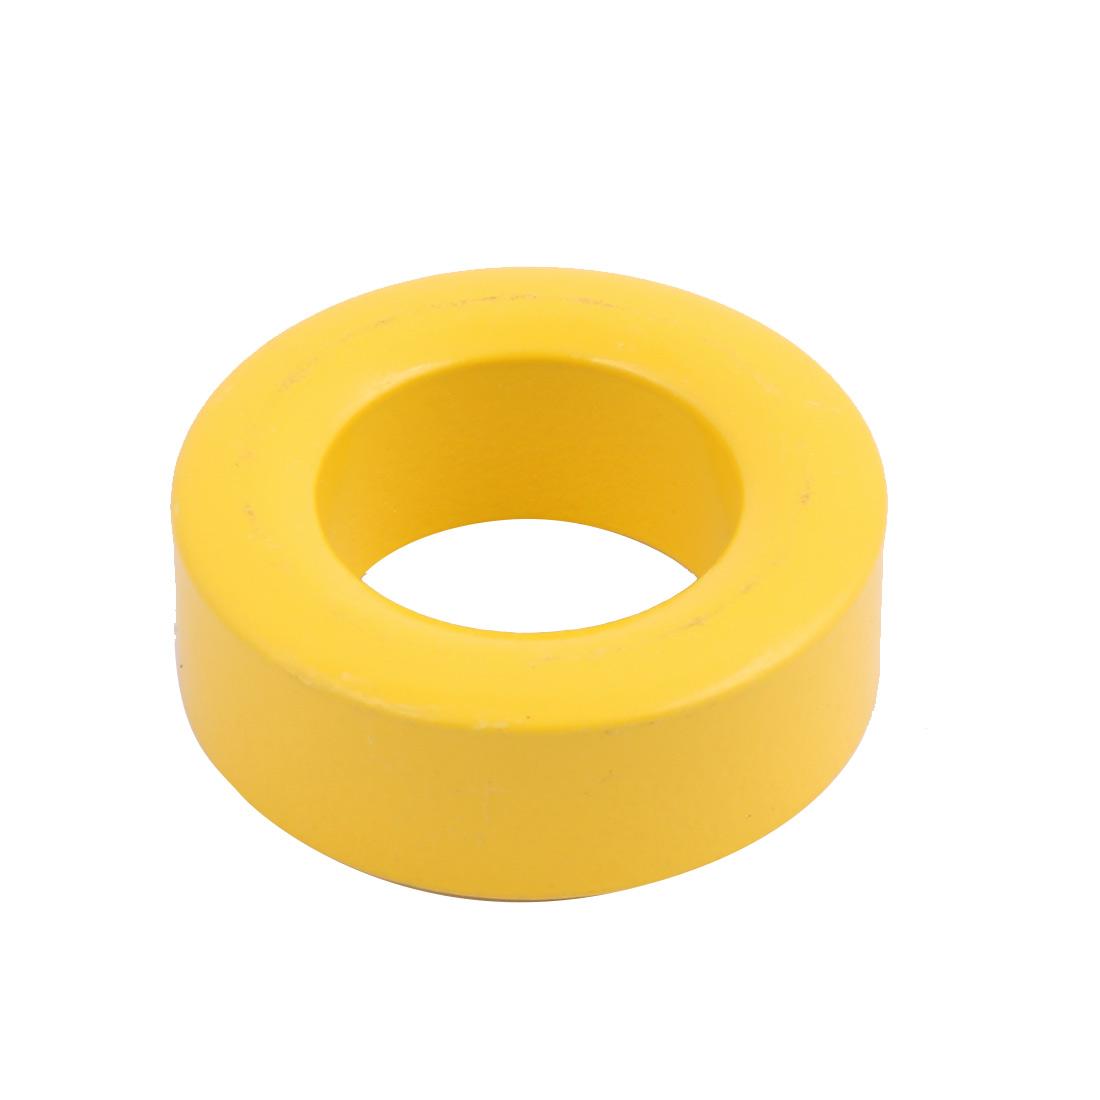 40mm x 23mm x 15mm Power Transformer Toroid Cores Ferrite Ring Magnet Yellow